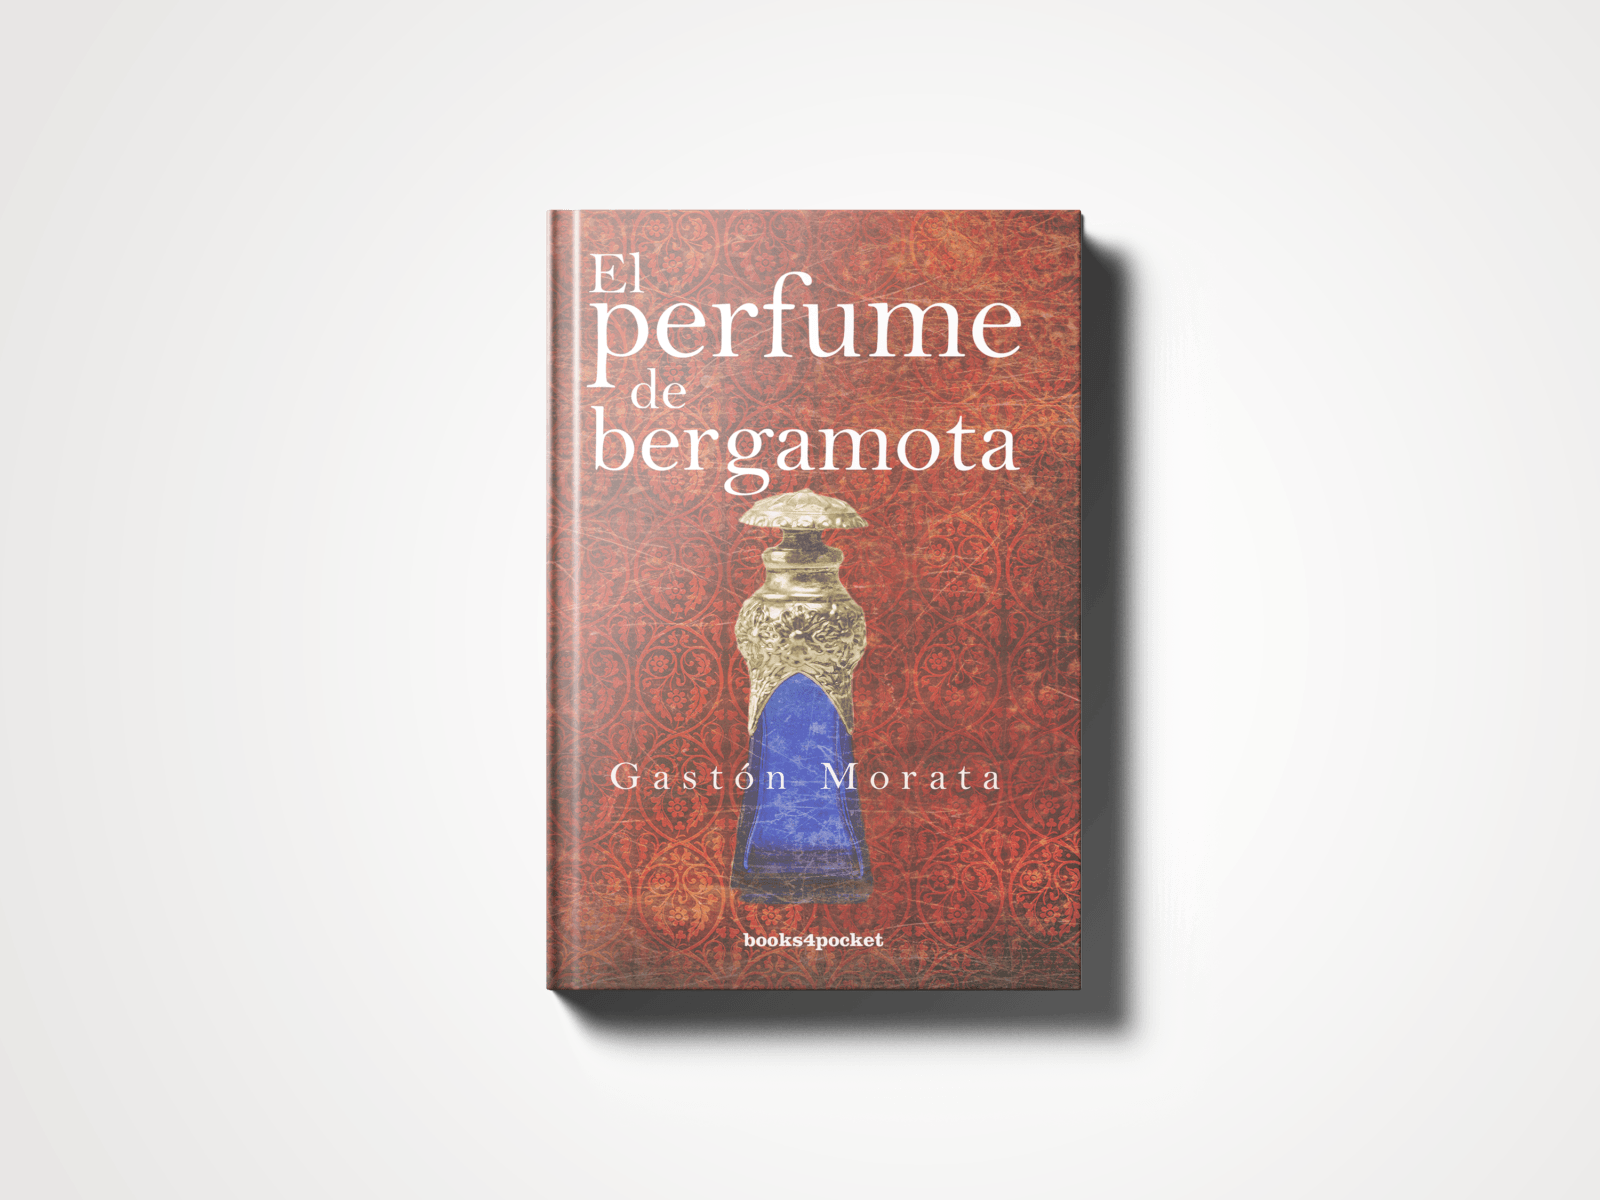 el perfume de bergamota dia del libro granada